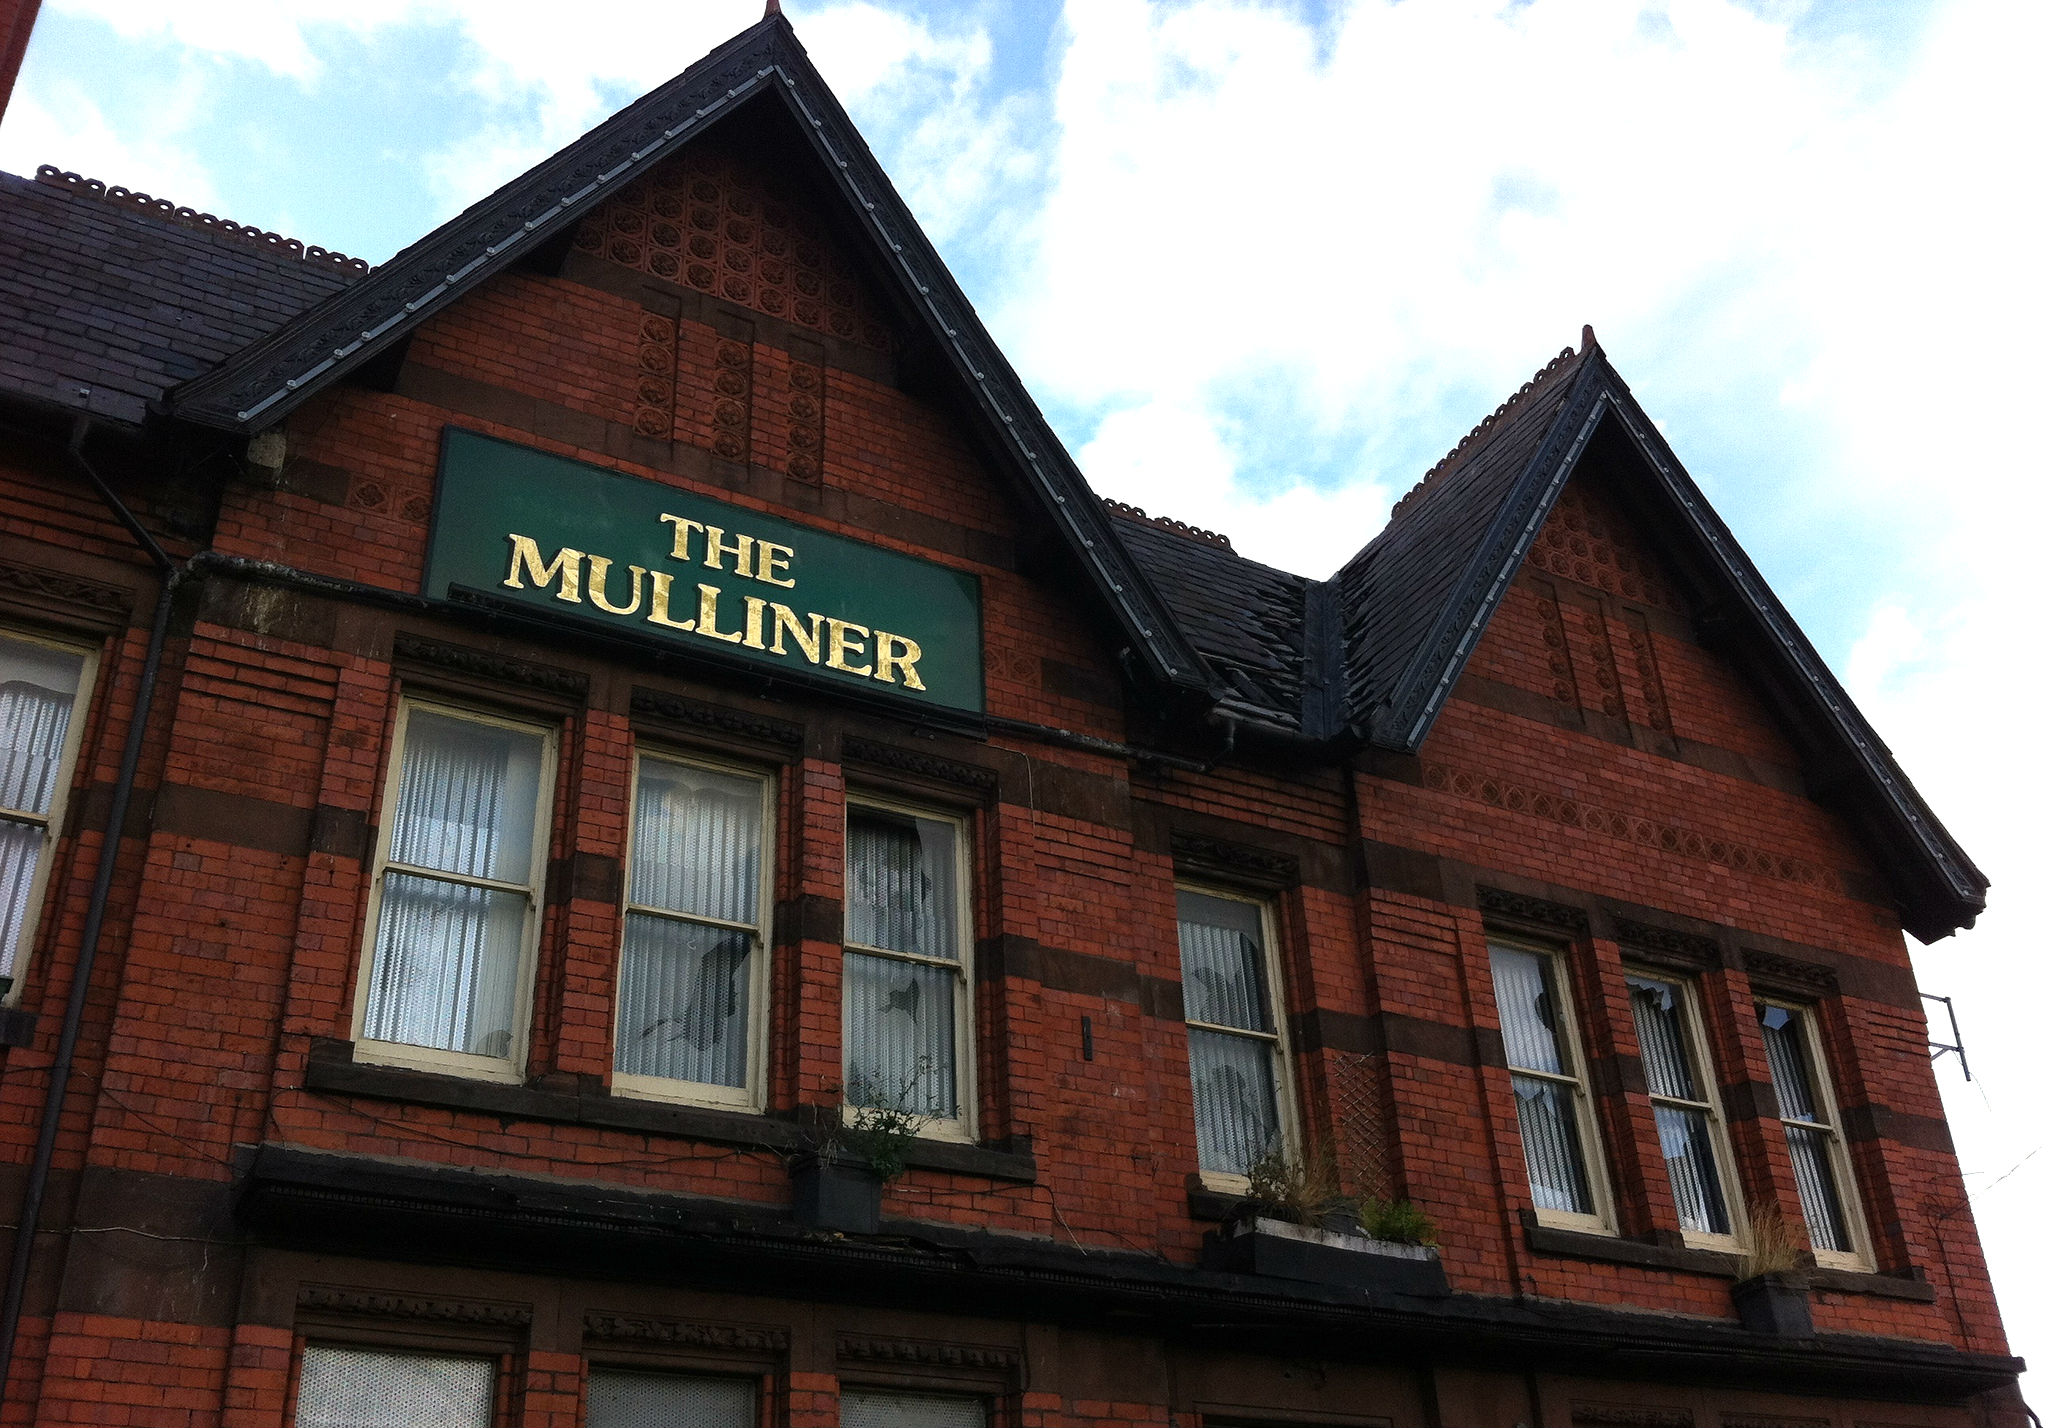 the mulliner